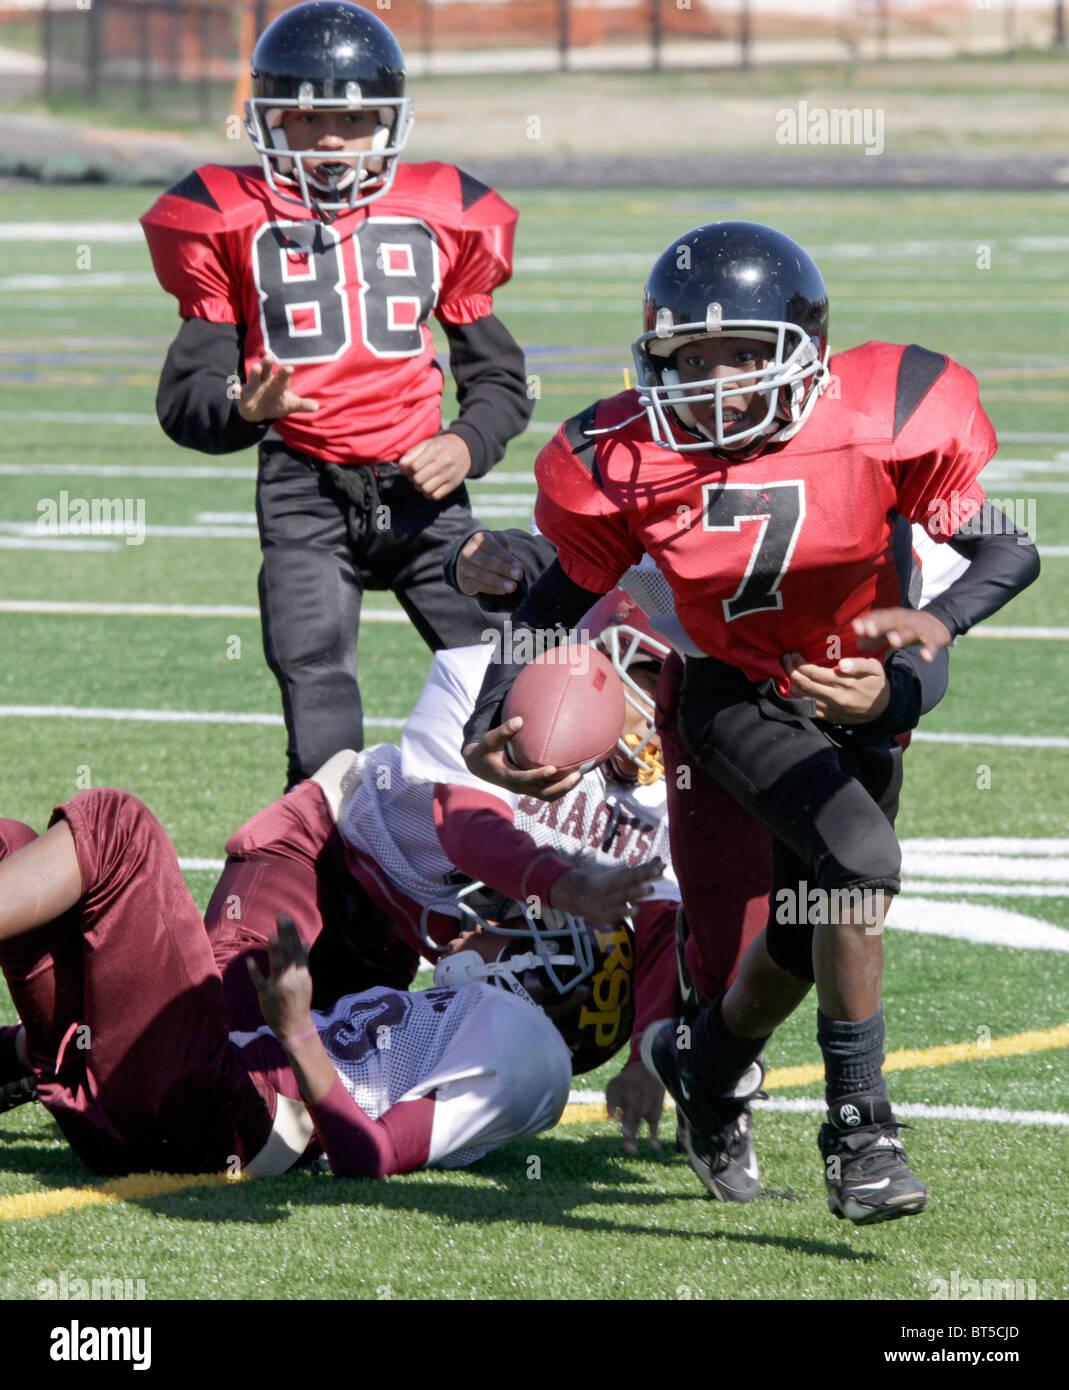 Inner City American Football League match à Roanoke, Virginie. Photo Stock